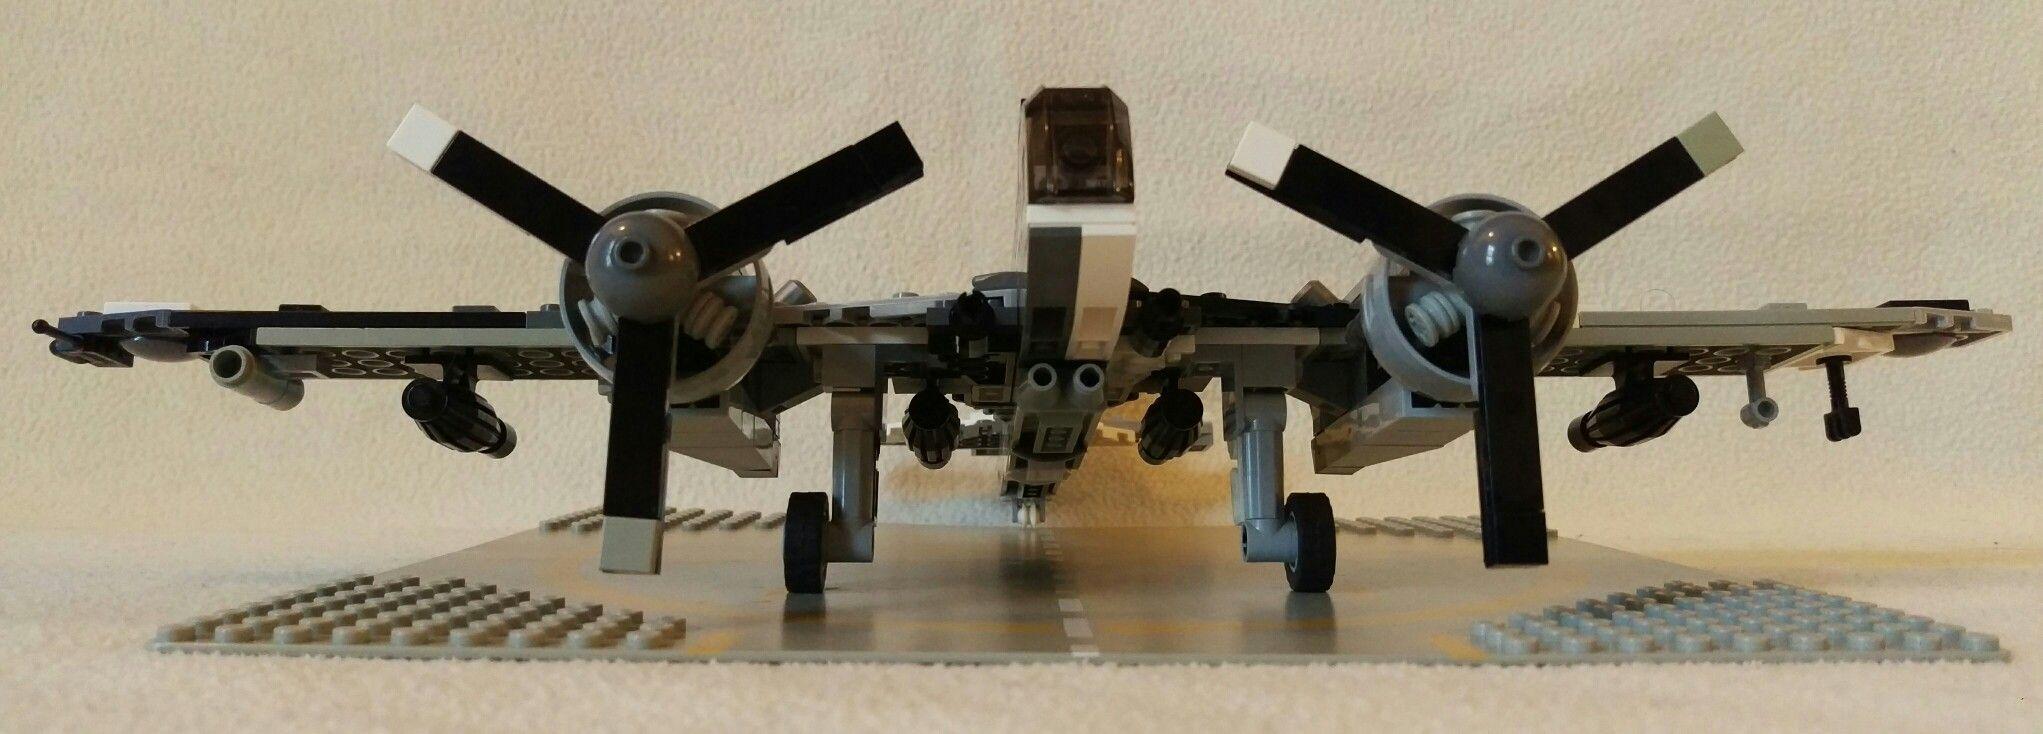 Lego Full House Fi 6 B Superowl 2x Hundson V 14 Stc Full House Ii Engines With